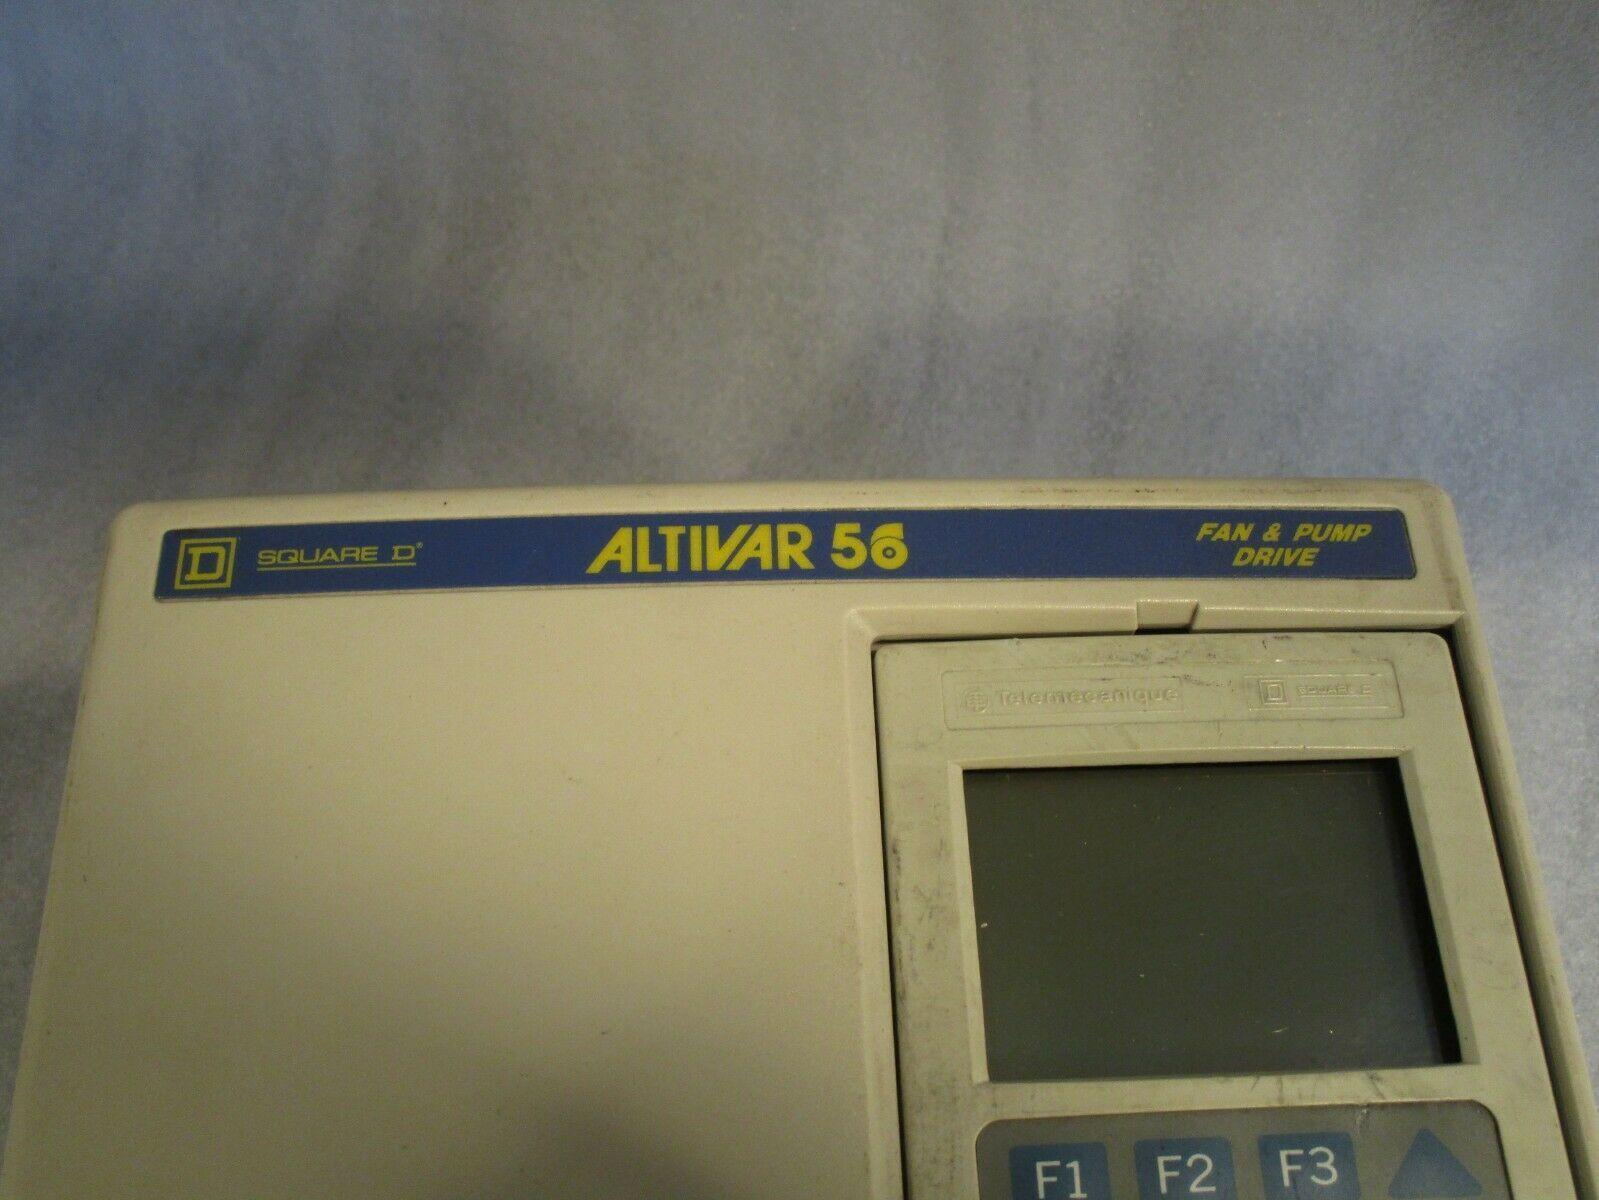 Square D Altivar 56 Drive ATV56U41N4 - For Parts